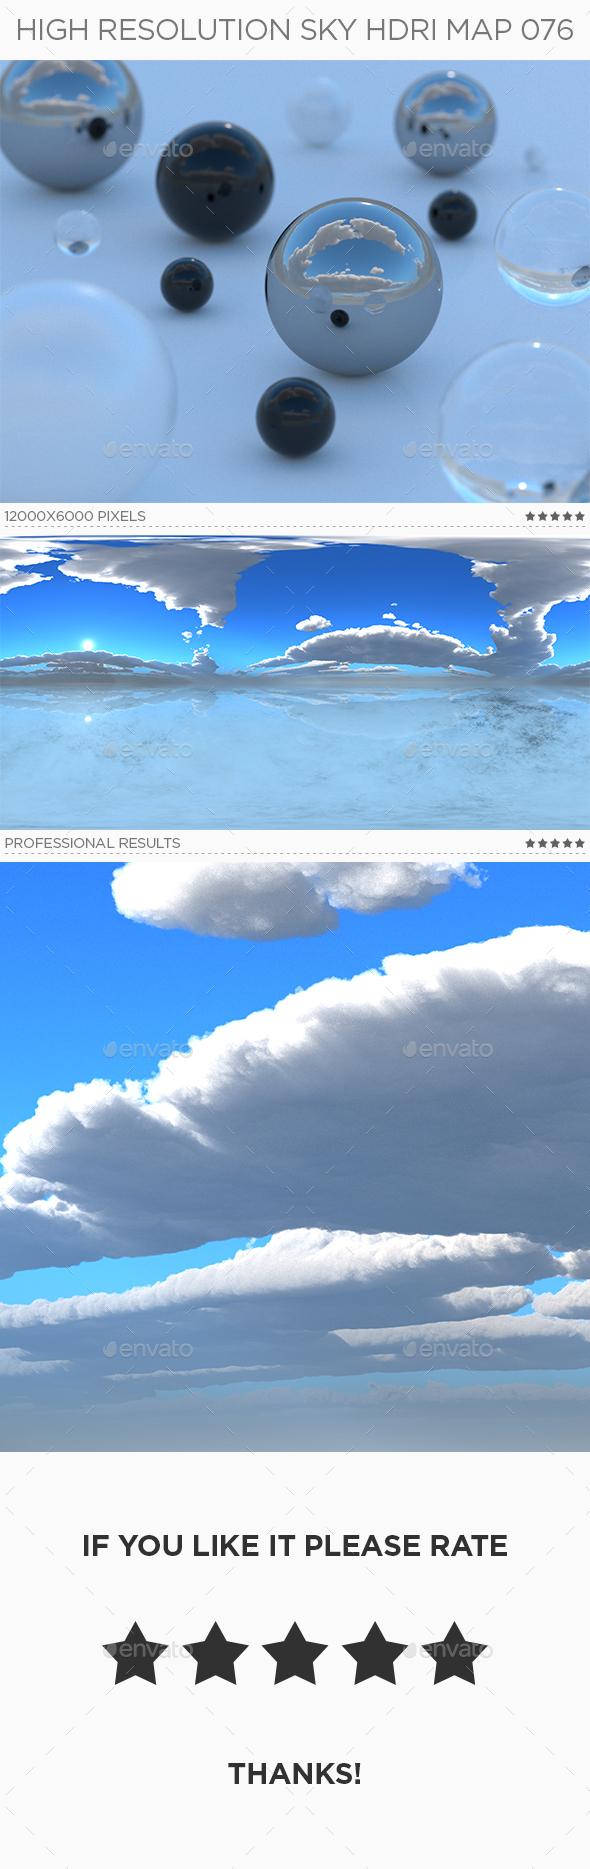 High Resolution Sky HDRi Map 076 - 3DOcean Item for Sale